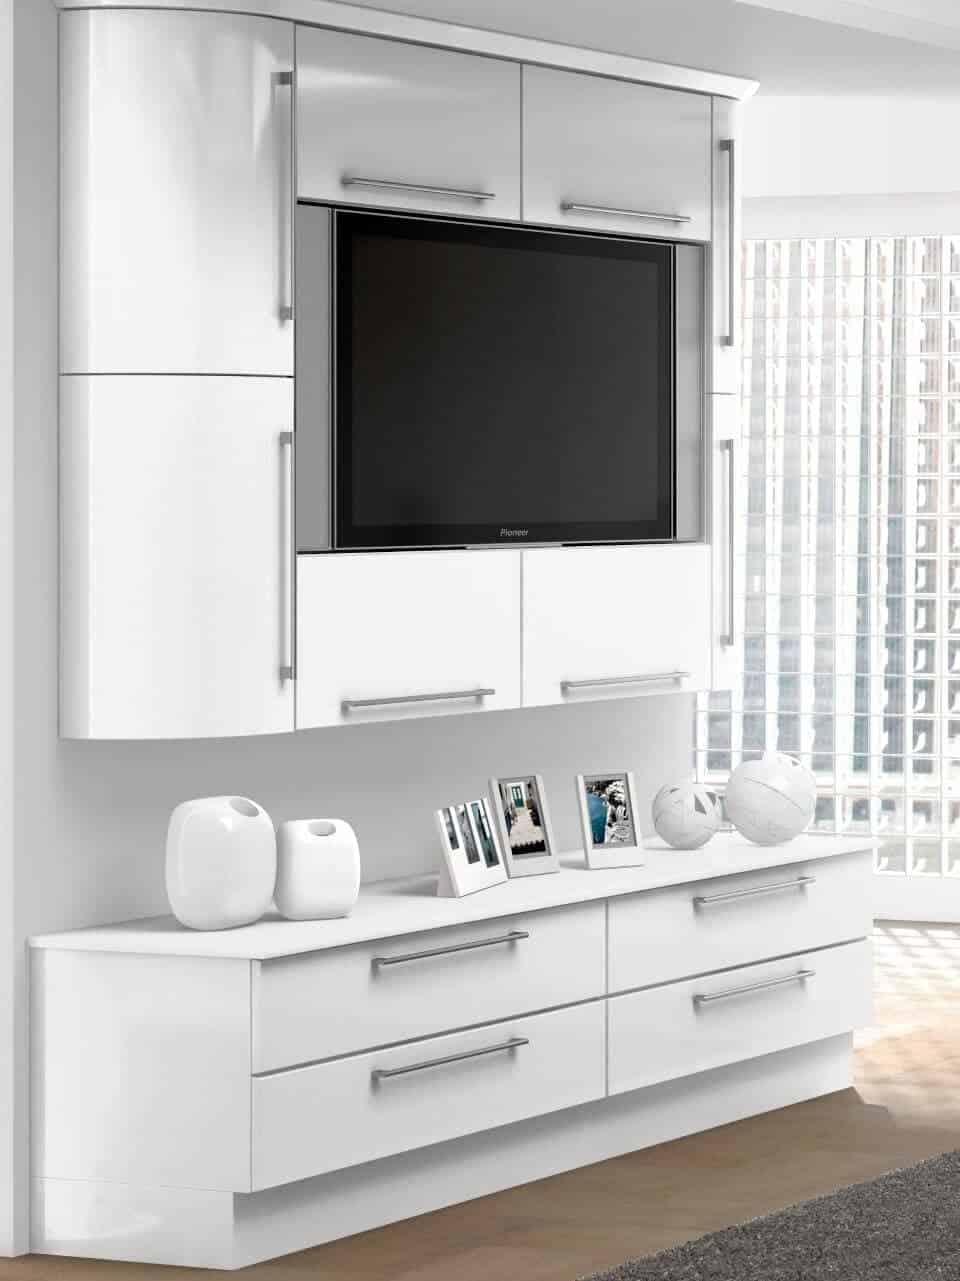 Goscote bedroom high gloss white